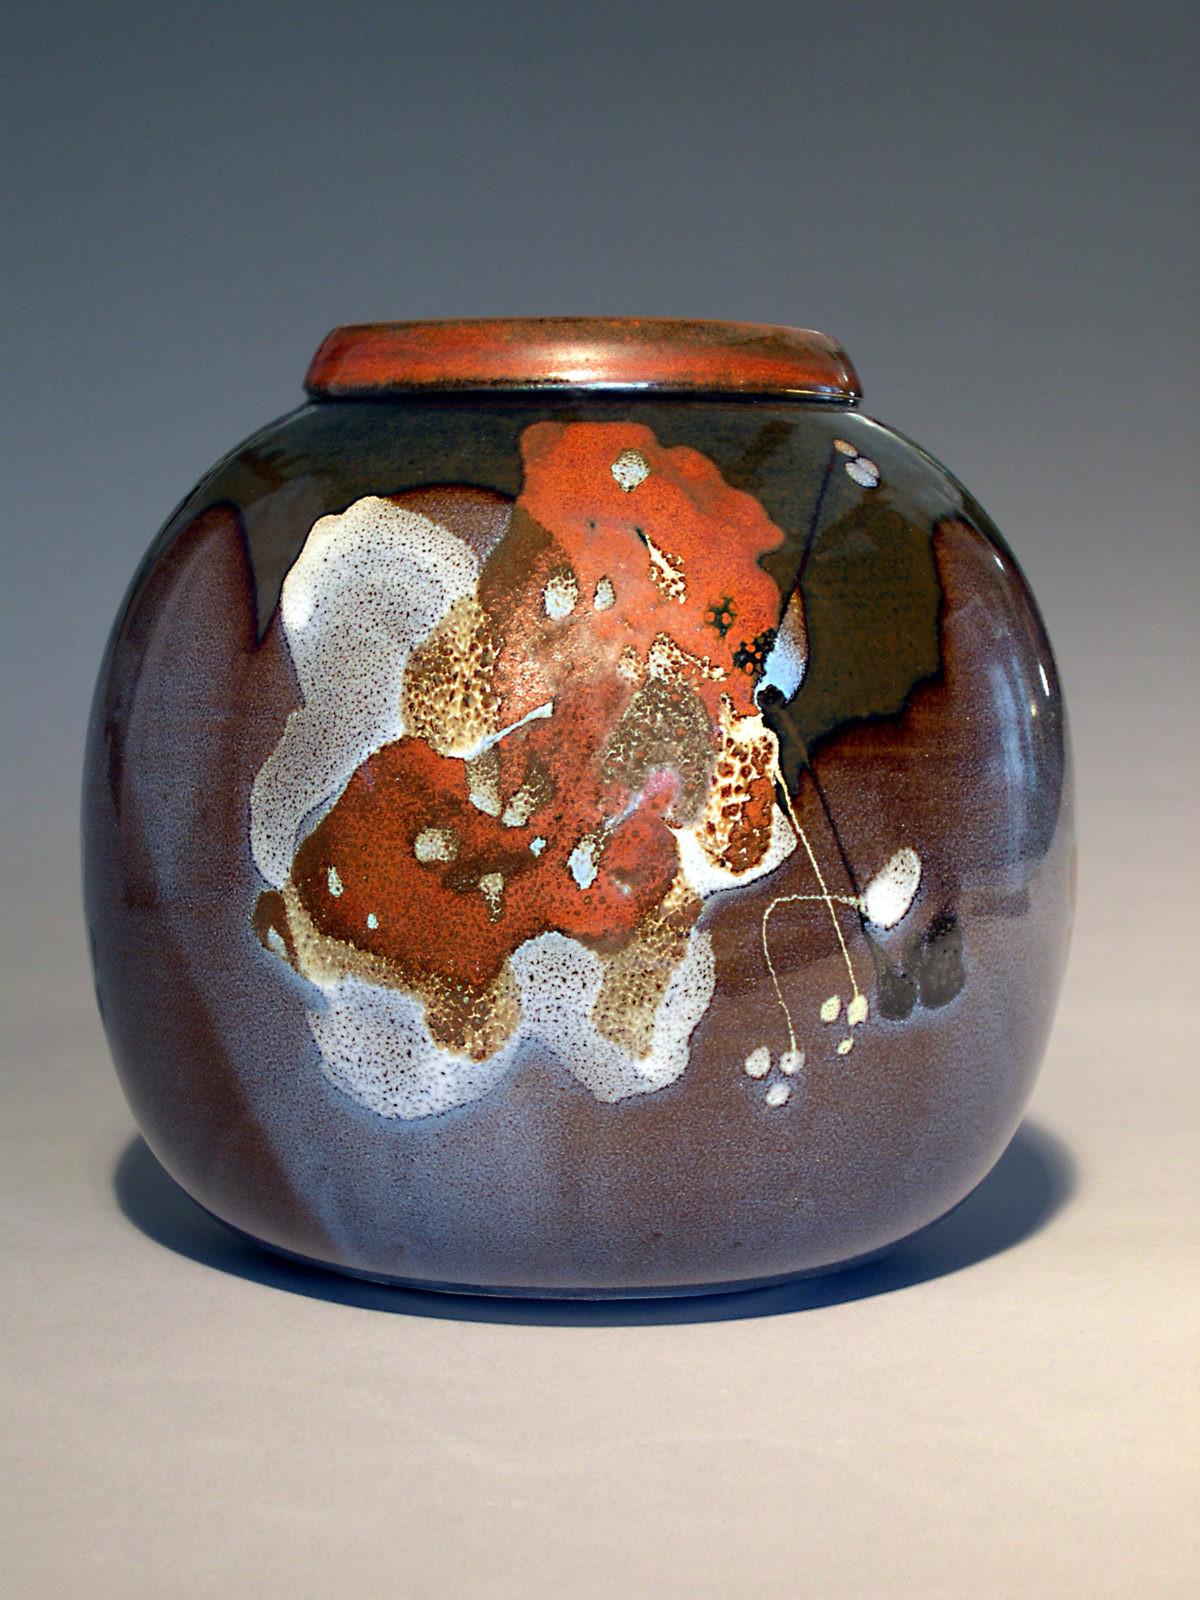 Anchor Hocking Bud Vase Of Https Risdcraft Com Cropped Risd Craft Header1 Copy 2017 02 21t20 Throughout Thomas Grabbert 255162 1054172